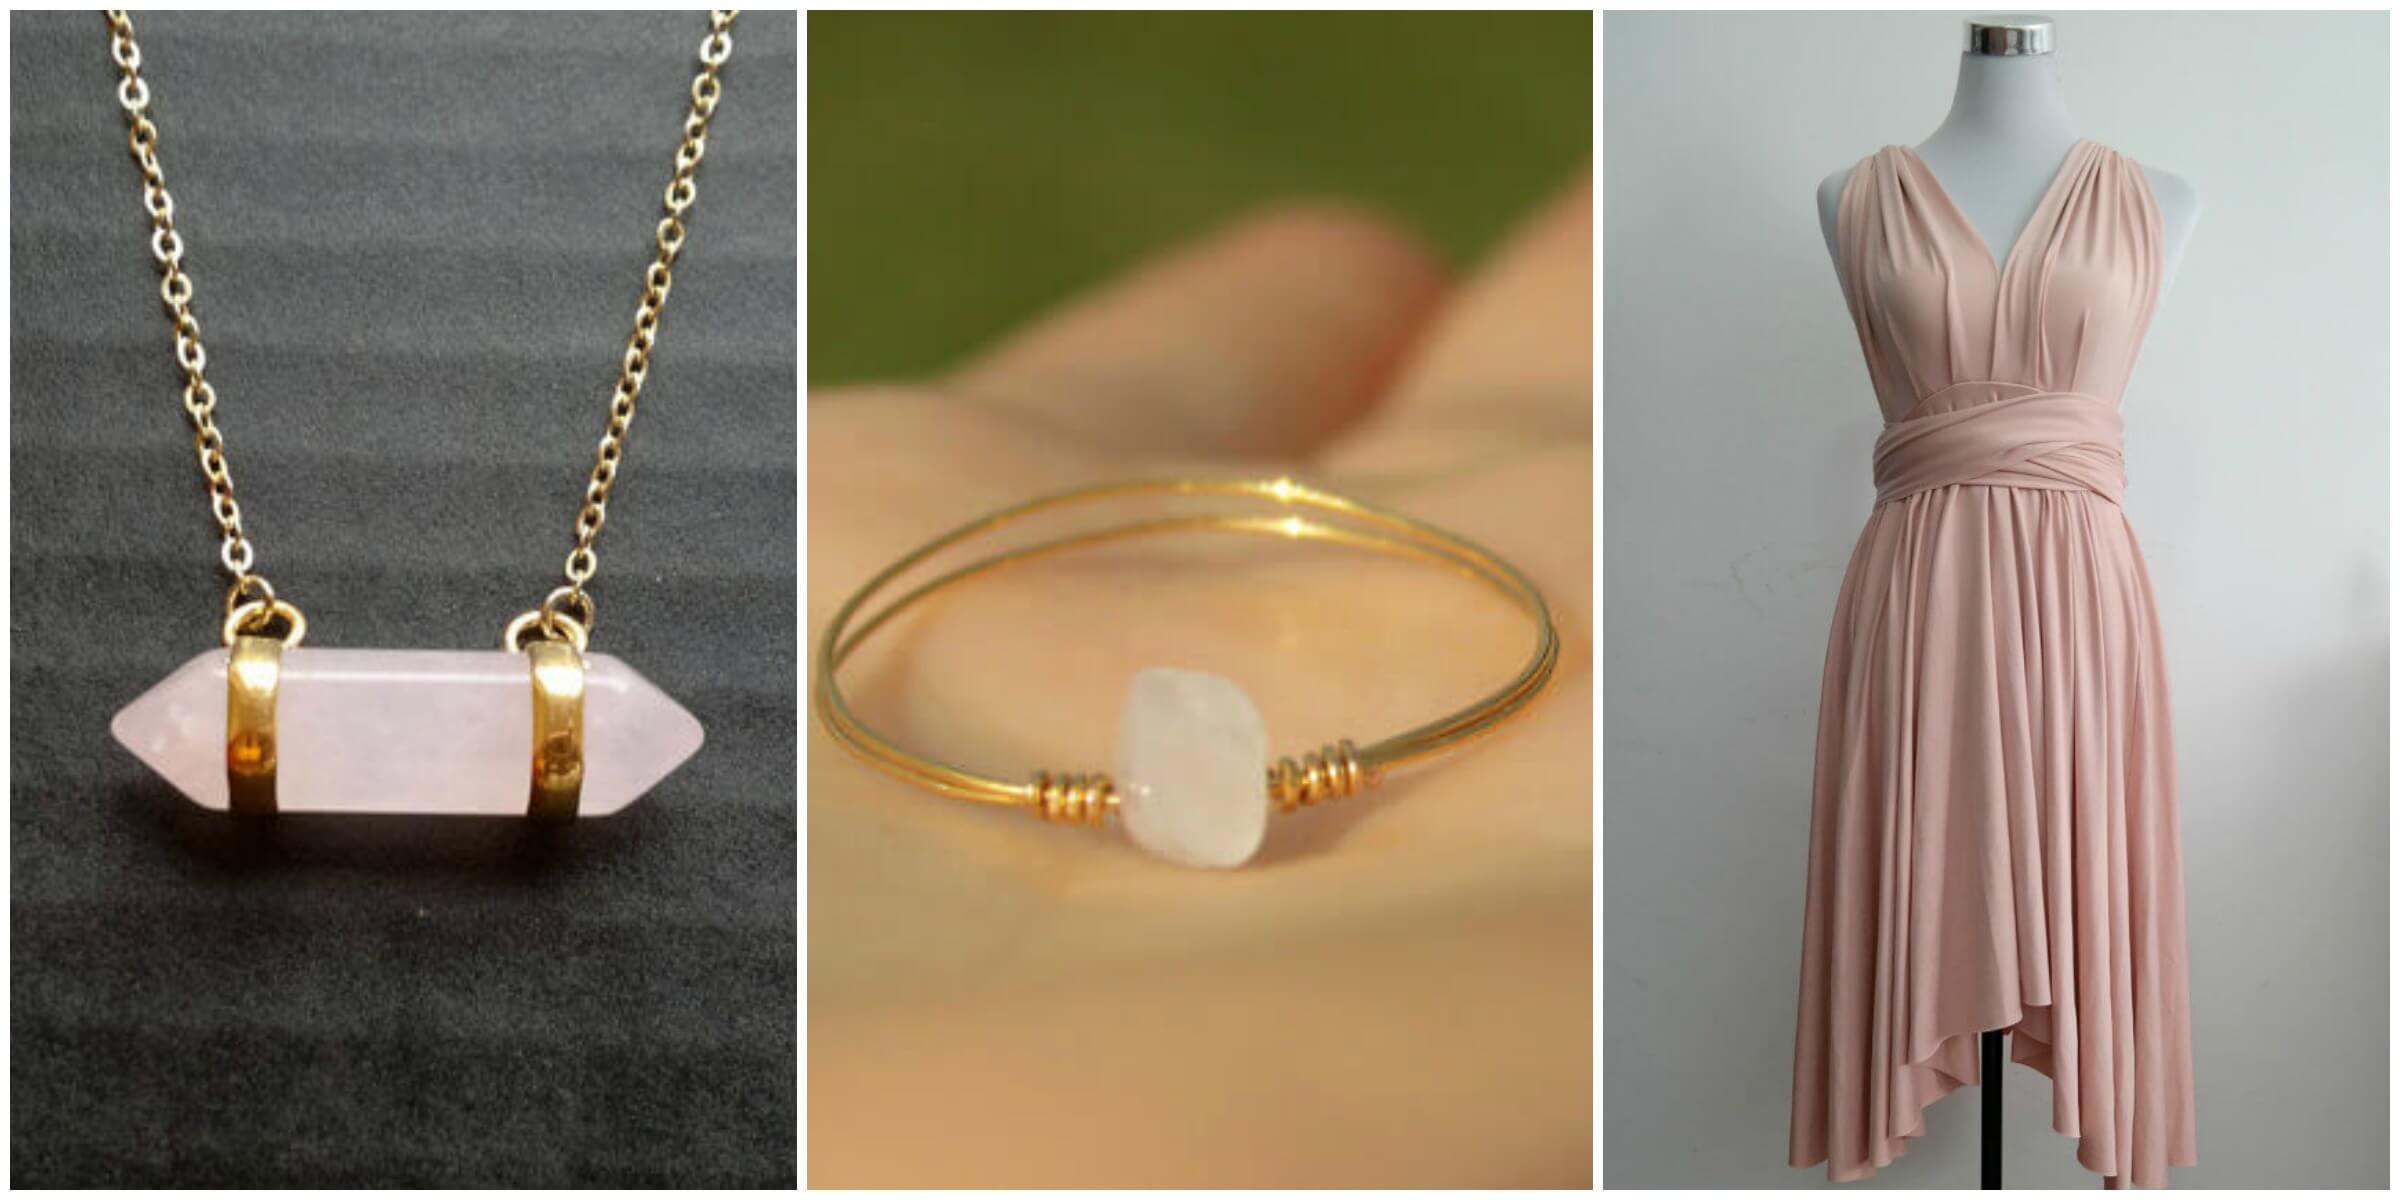 Rose Quartz necklace by Sinus Finnicus on Etsy; Dainty Rose Quartz Ring via the Purple Rosebud on Etsy; Knee Length Convertible Infinity Multi Wrap Dress via LilZoo on Etsy